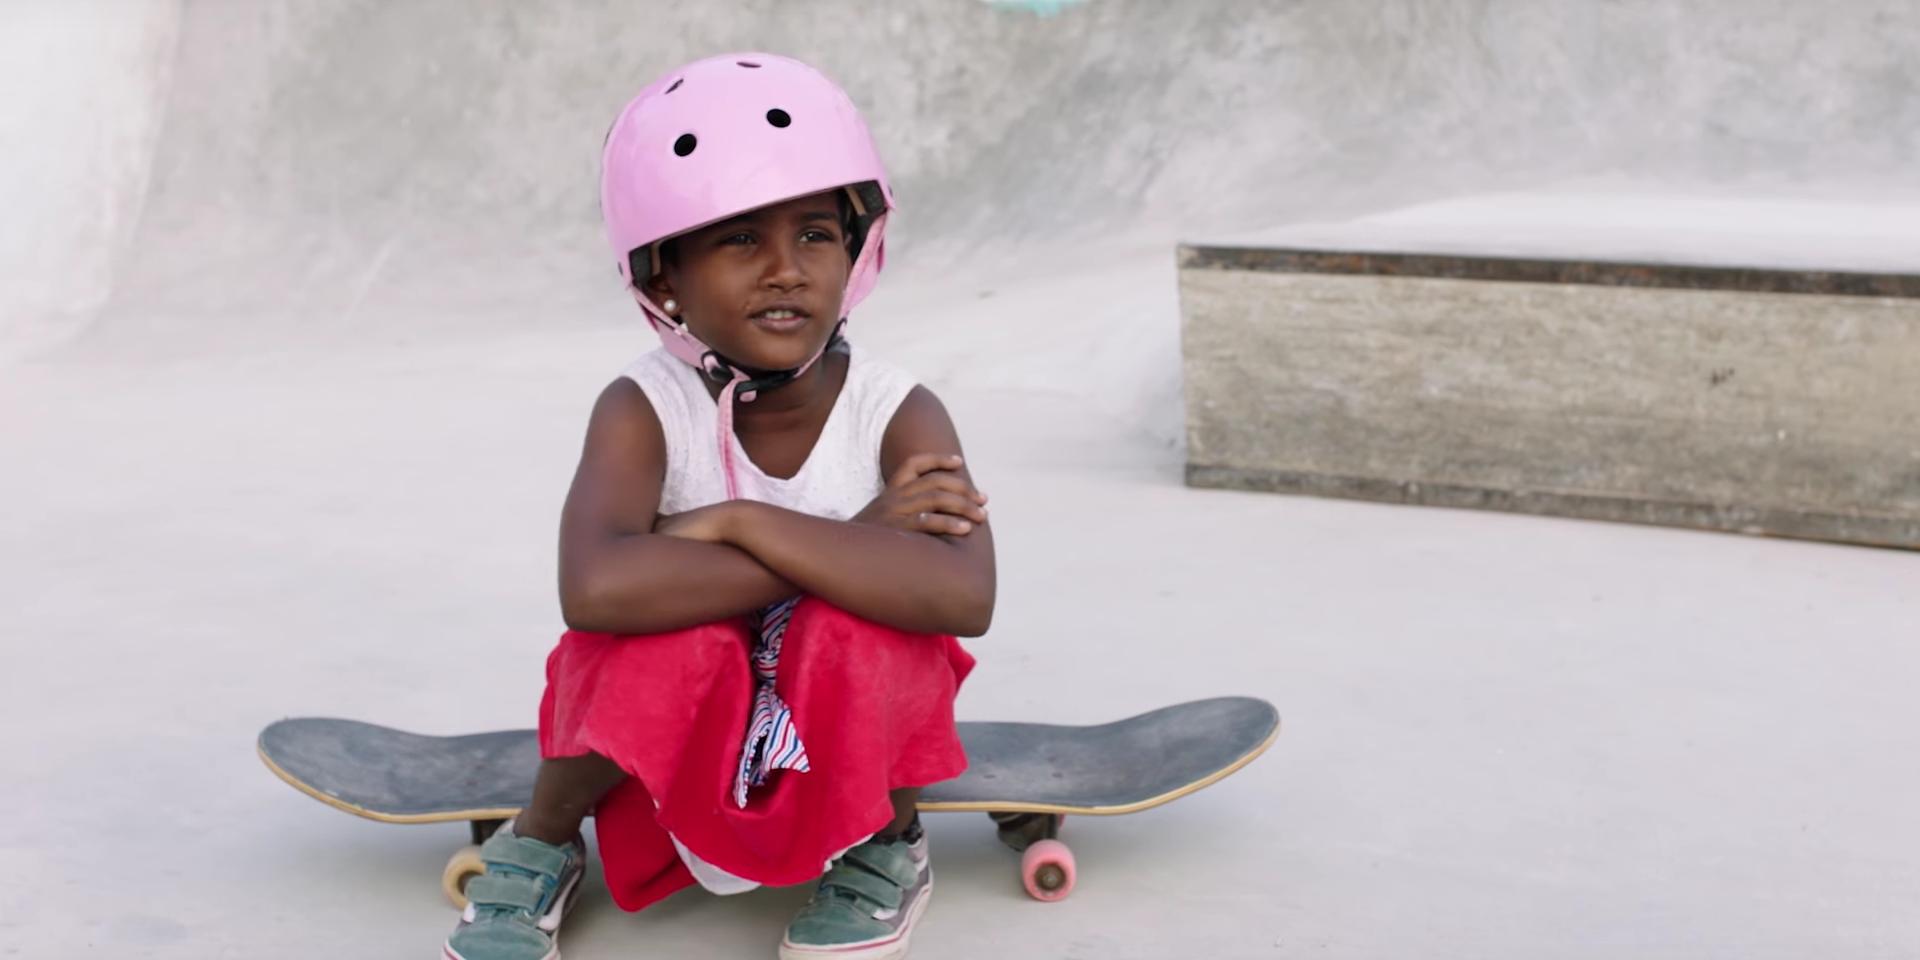 f74051a057abe2 girls-skate-india-la-nouvelle-campagne-girl-power-de-vans